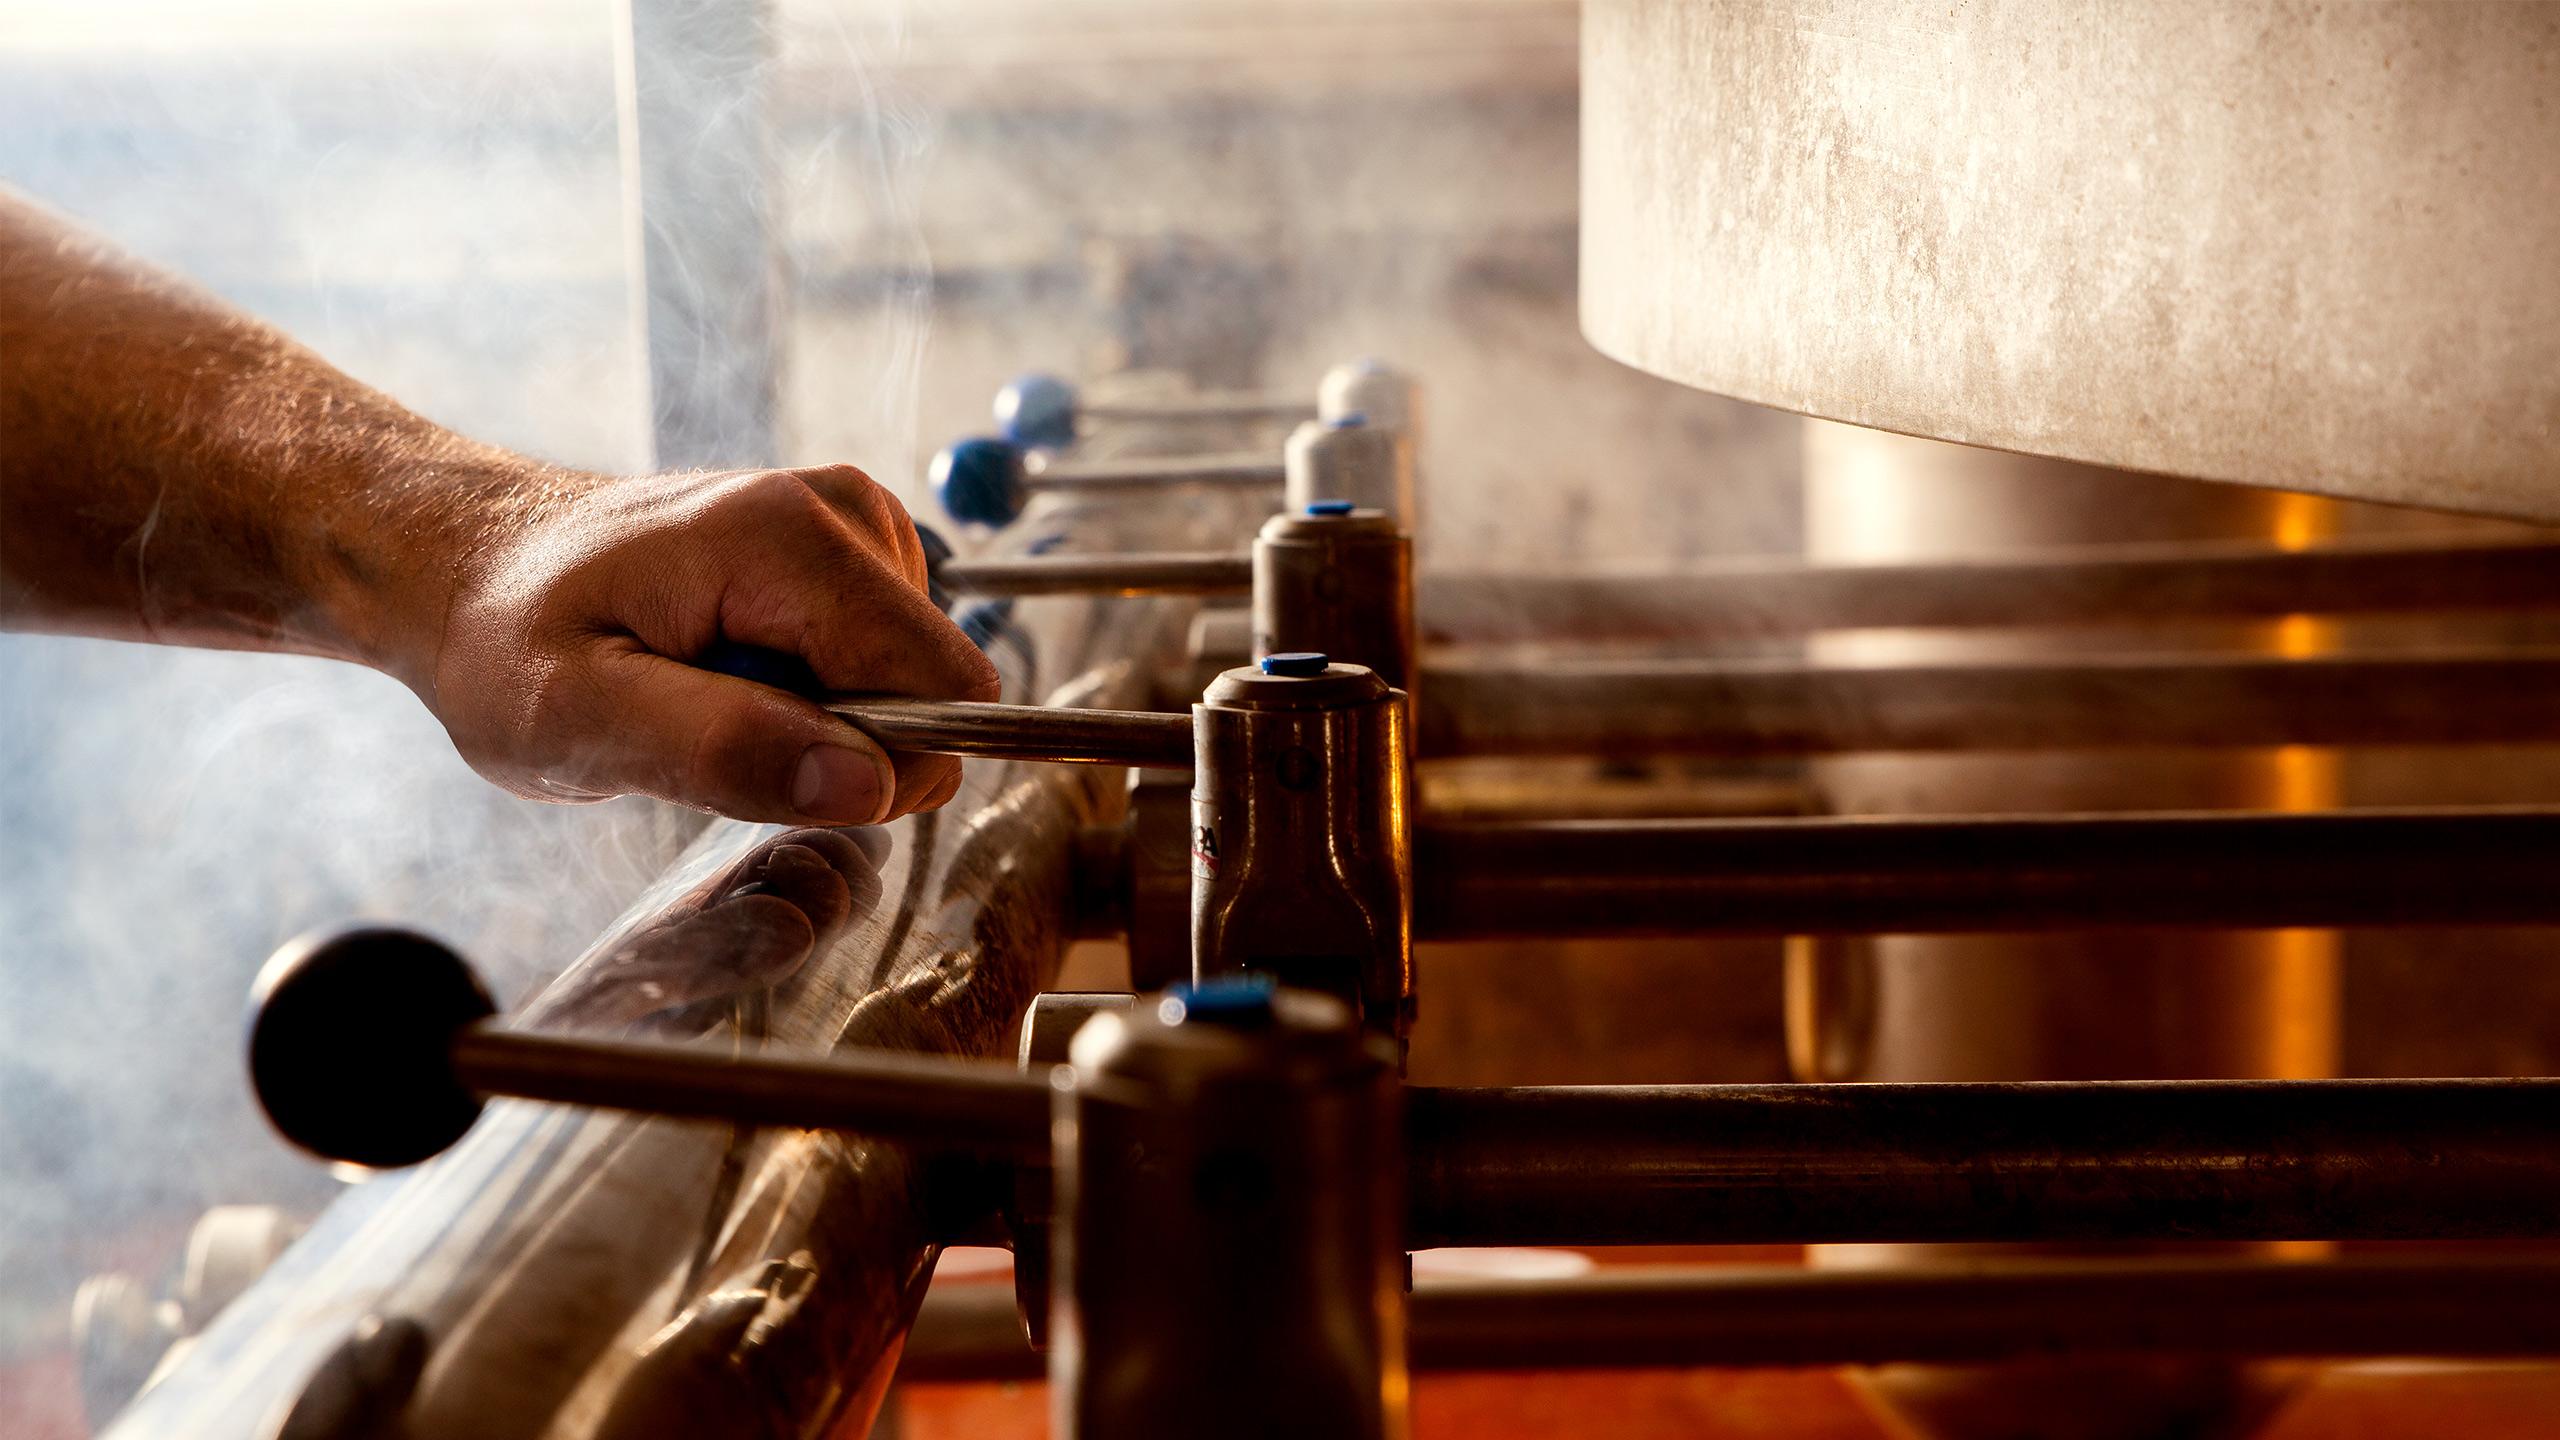 Lautering - La Binchoise Brewery Process